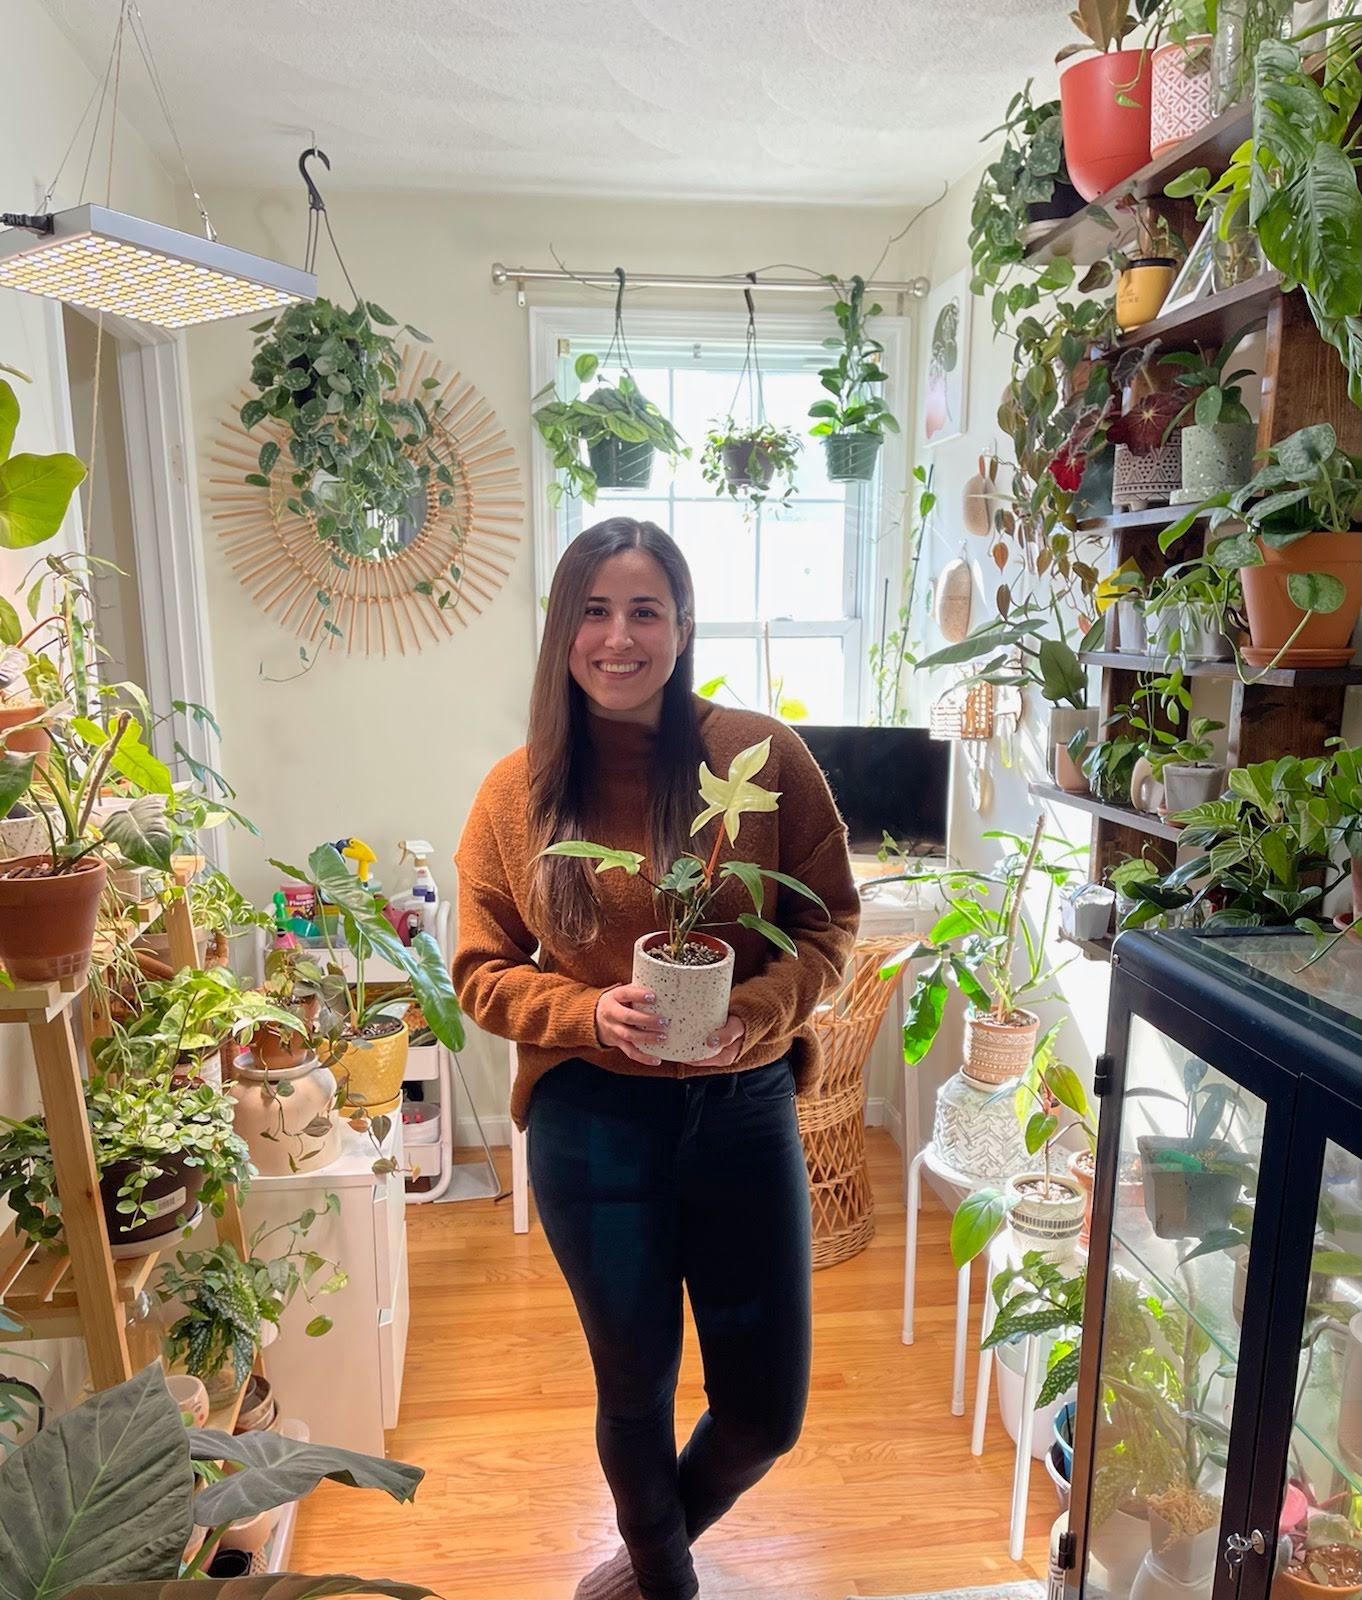 The Real Houseplants of Boston founder Carol Resende